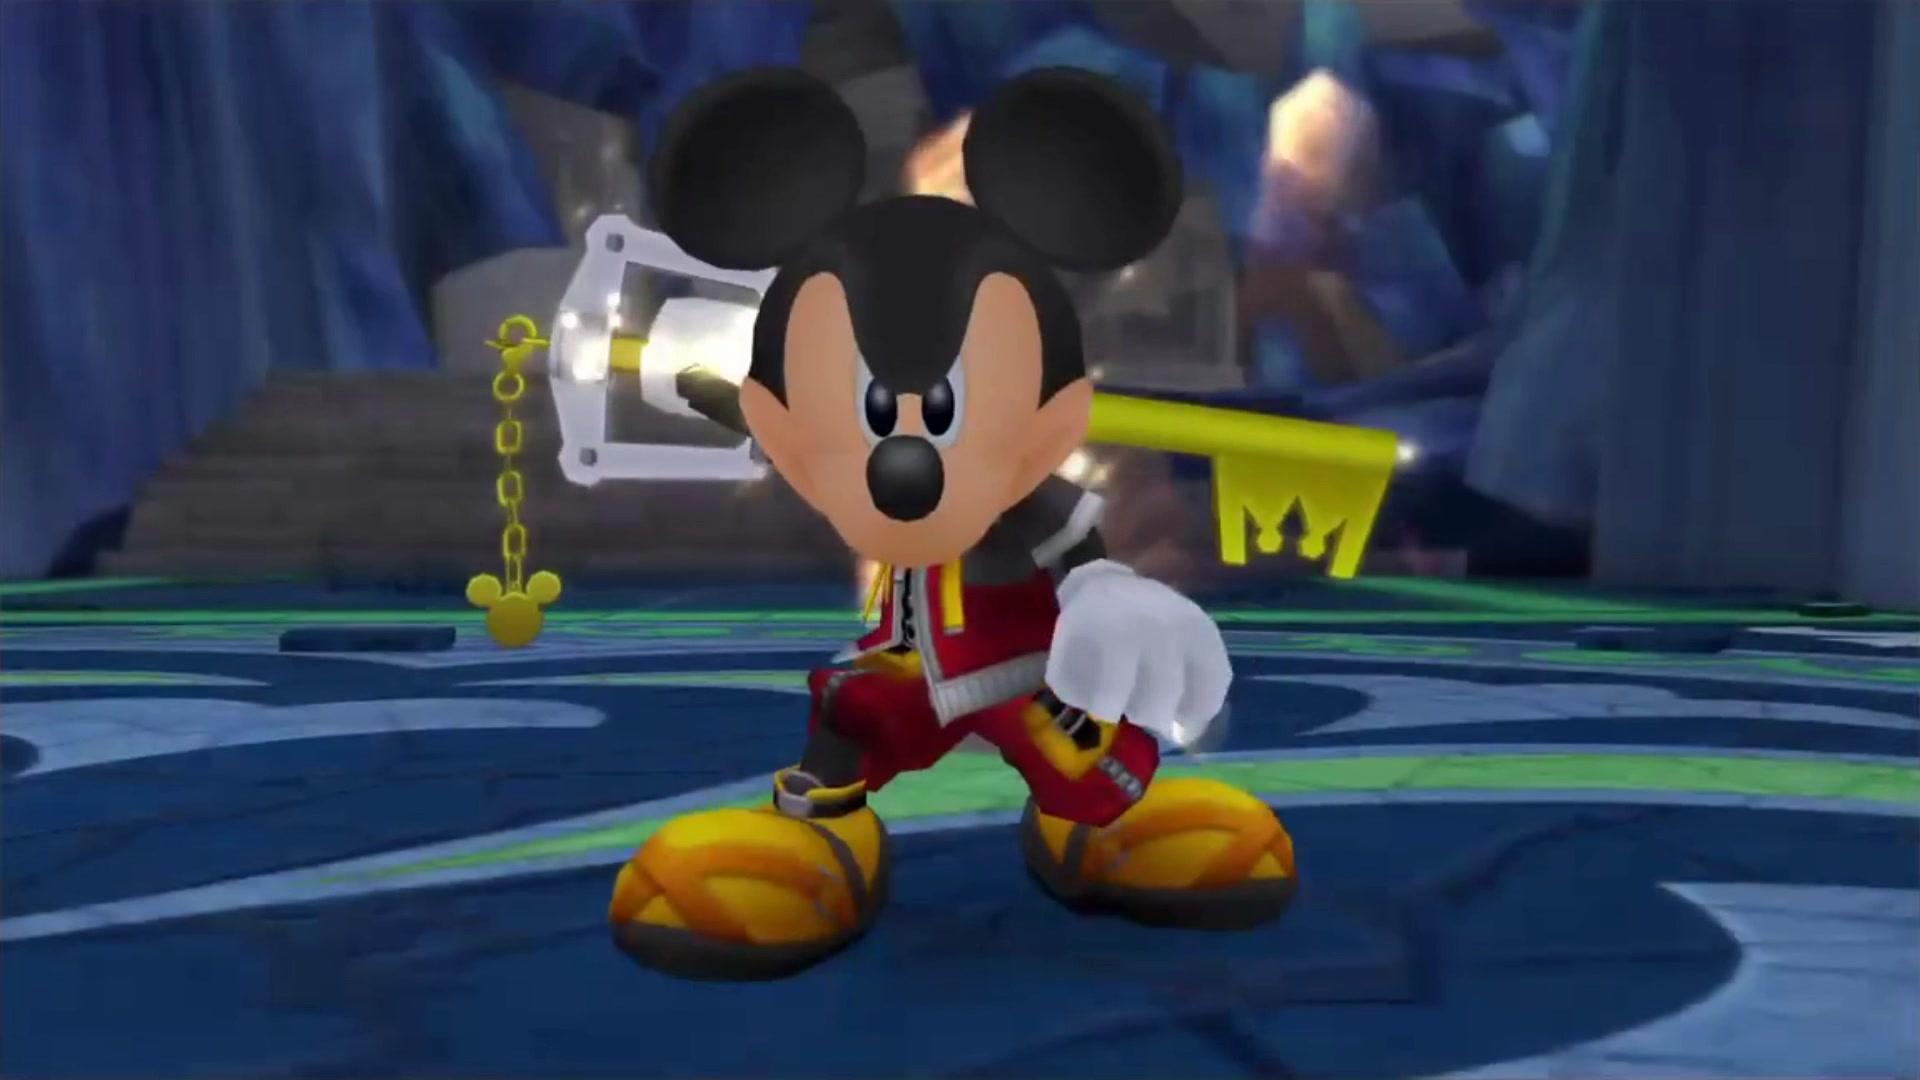 Kingdom Hearts 2 HD 1.5 + 2.5 ReMIX Goofy Dies/Mickey's Revenge 2